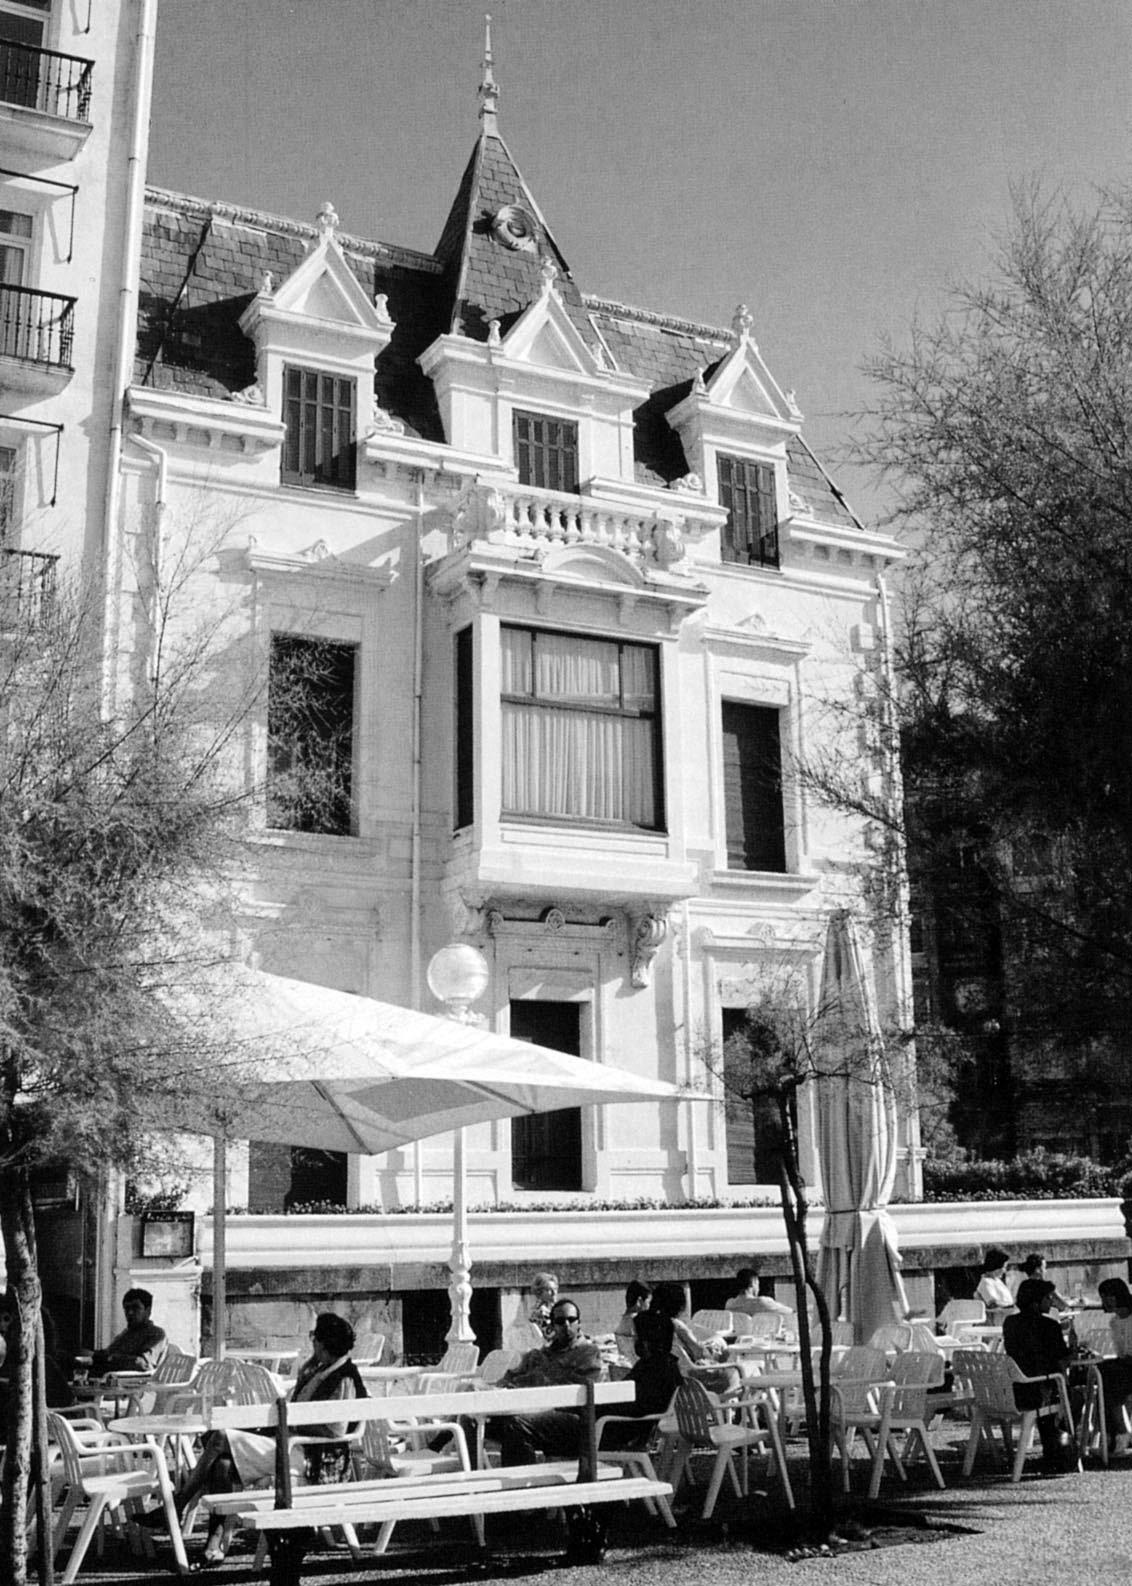 San sebasti n patrimonio cultural las p rdidas - Arquitectos san sebastian ...